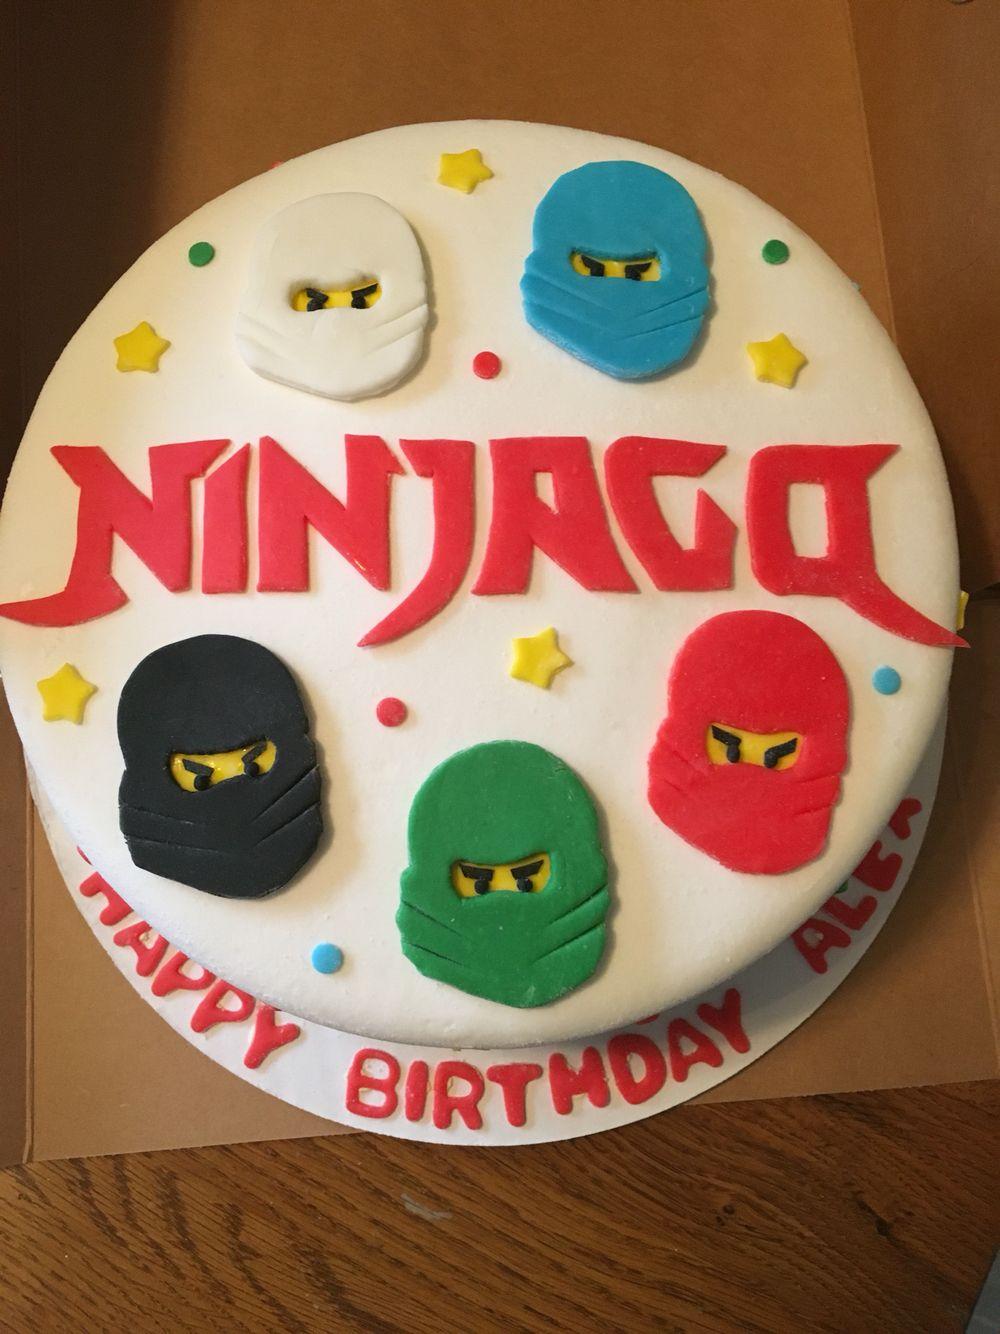 Ninjago birthday cake | My Cakes and Cupcakes | Pinterest ...